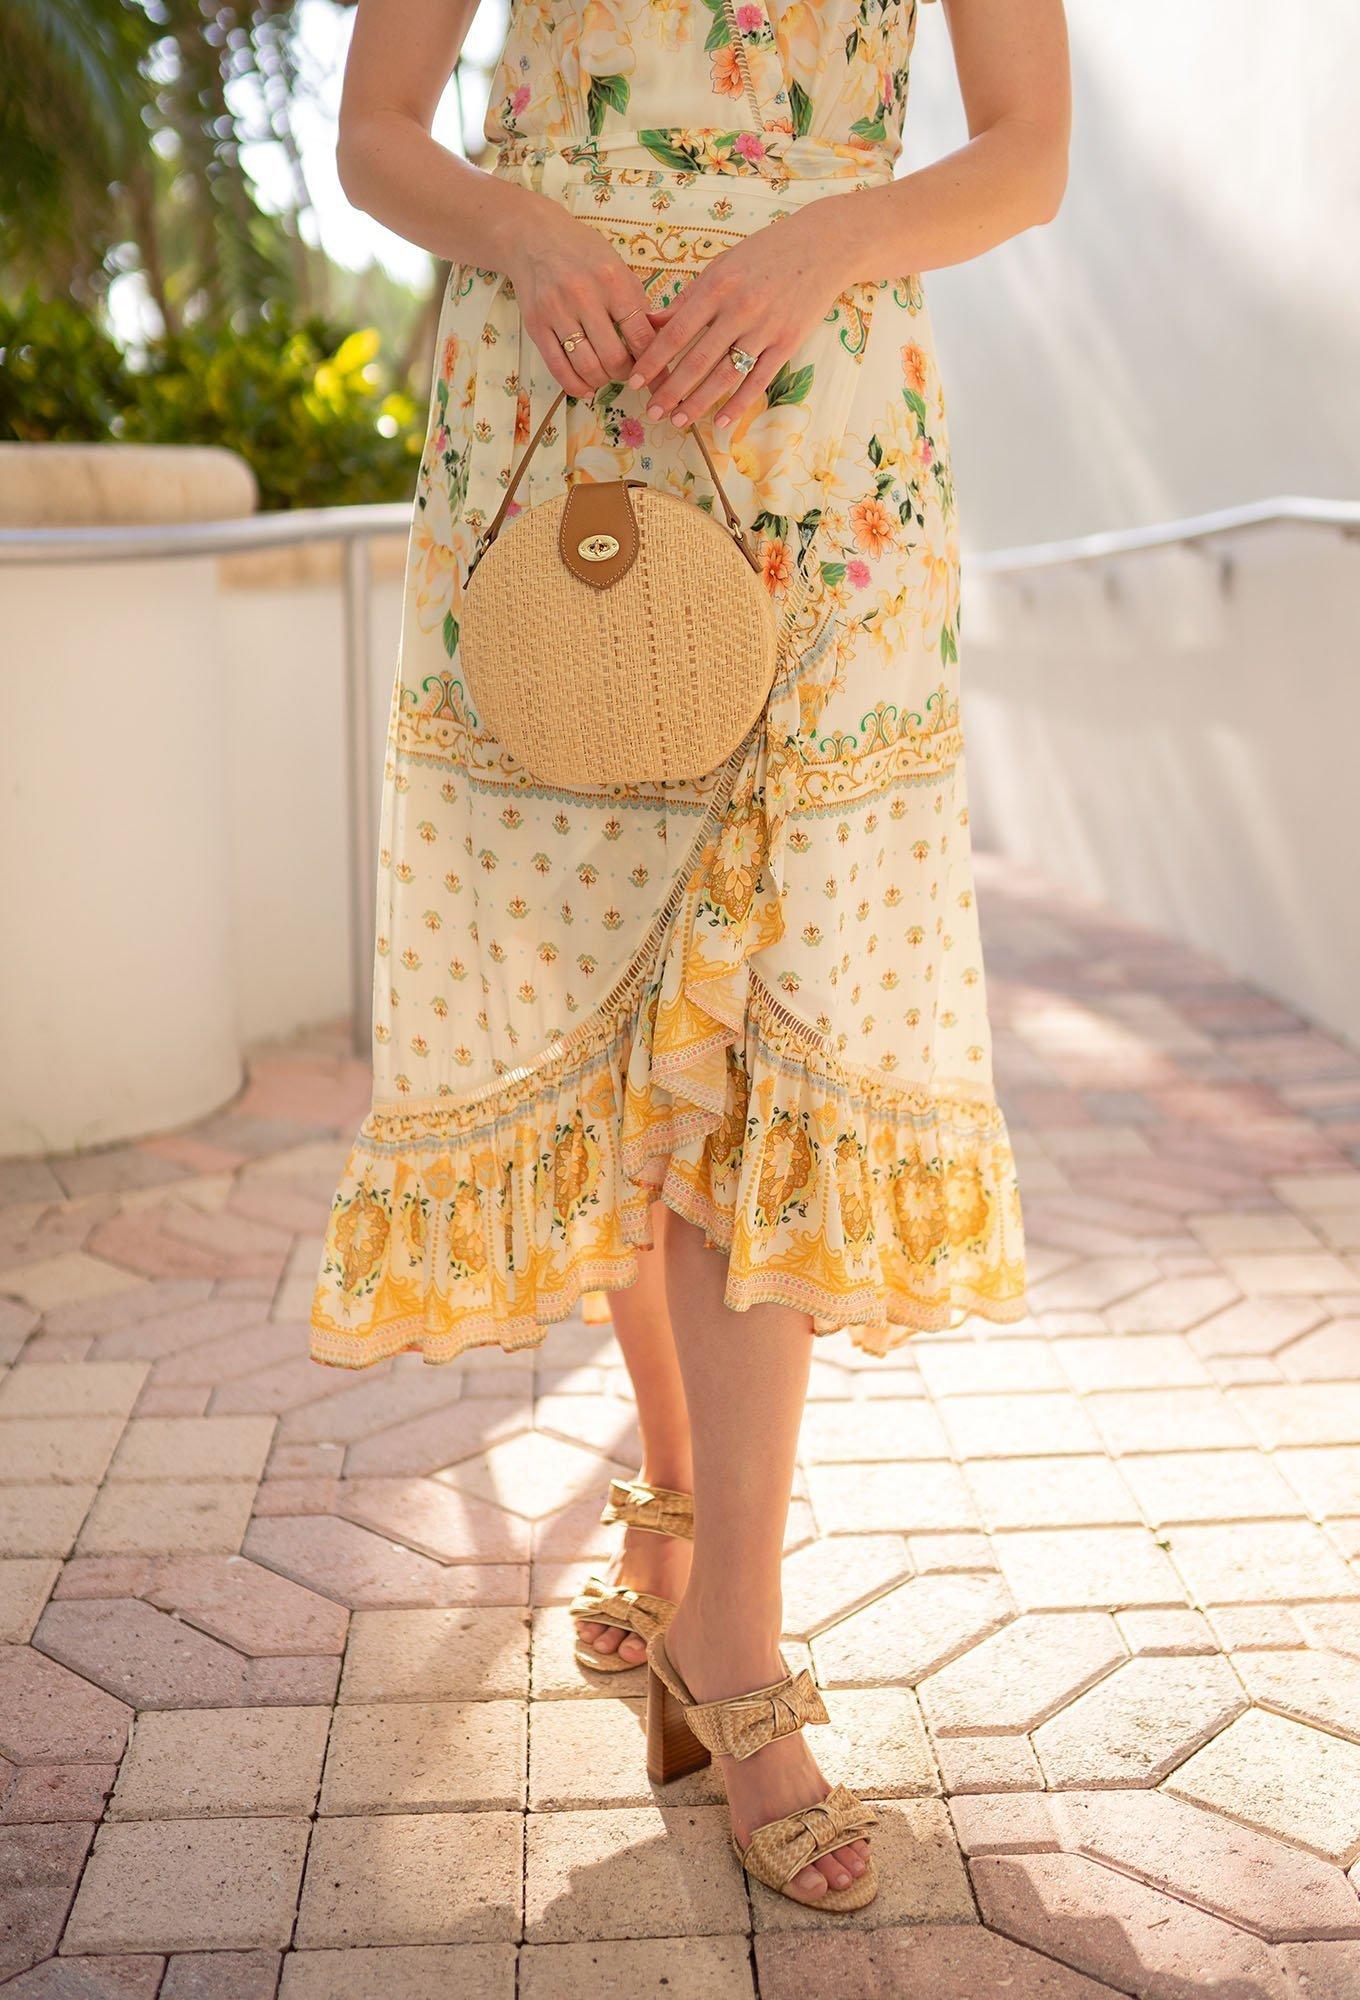 Ashley Brooke holding J.McLaughlin handbag on Miami's South Beach